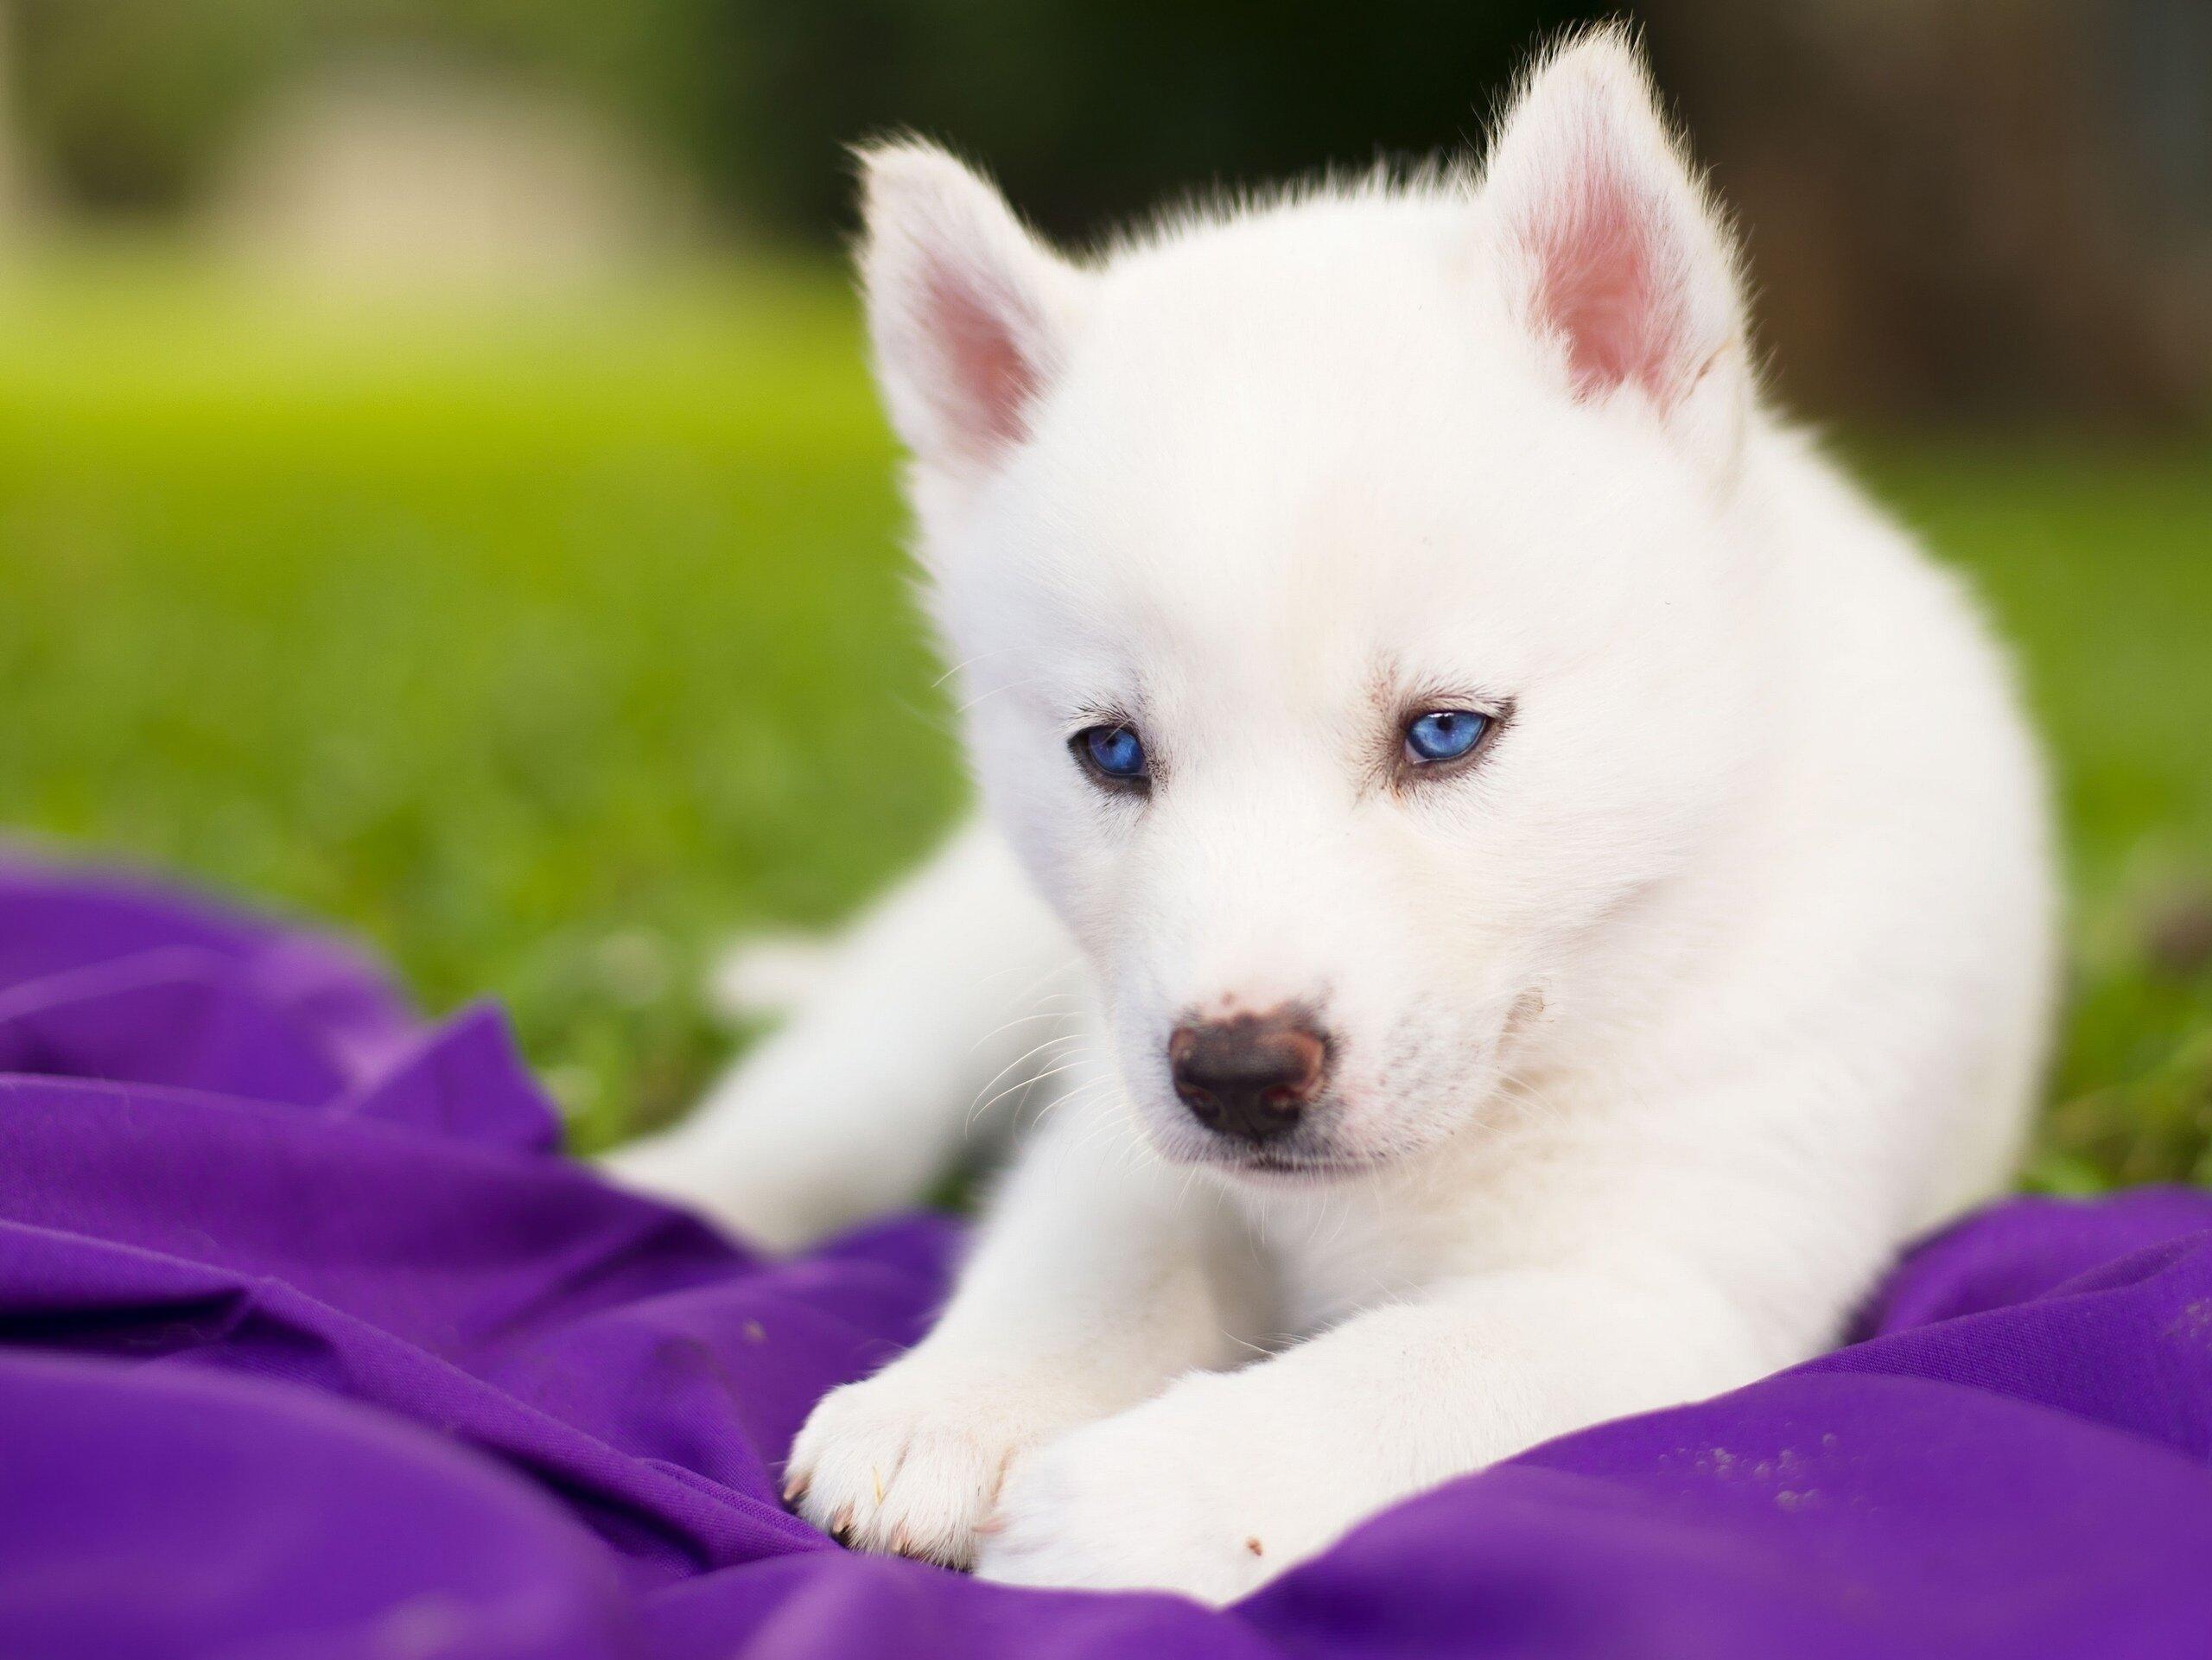 Siberian Husky Husky Dog Puppy White Blue Eyes Baby Wallpaper 2560x1921 620750 Wallpaperup